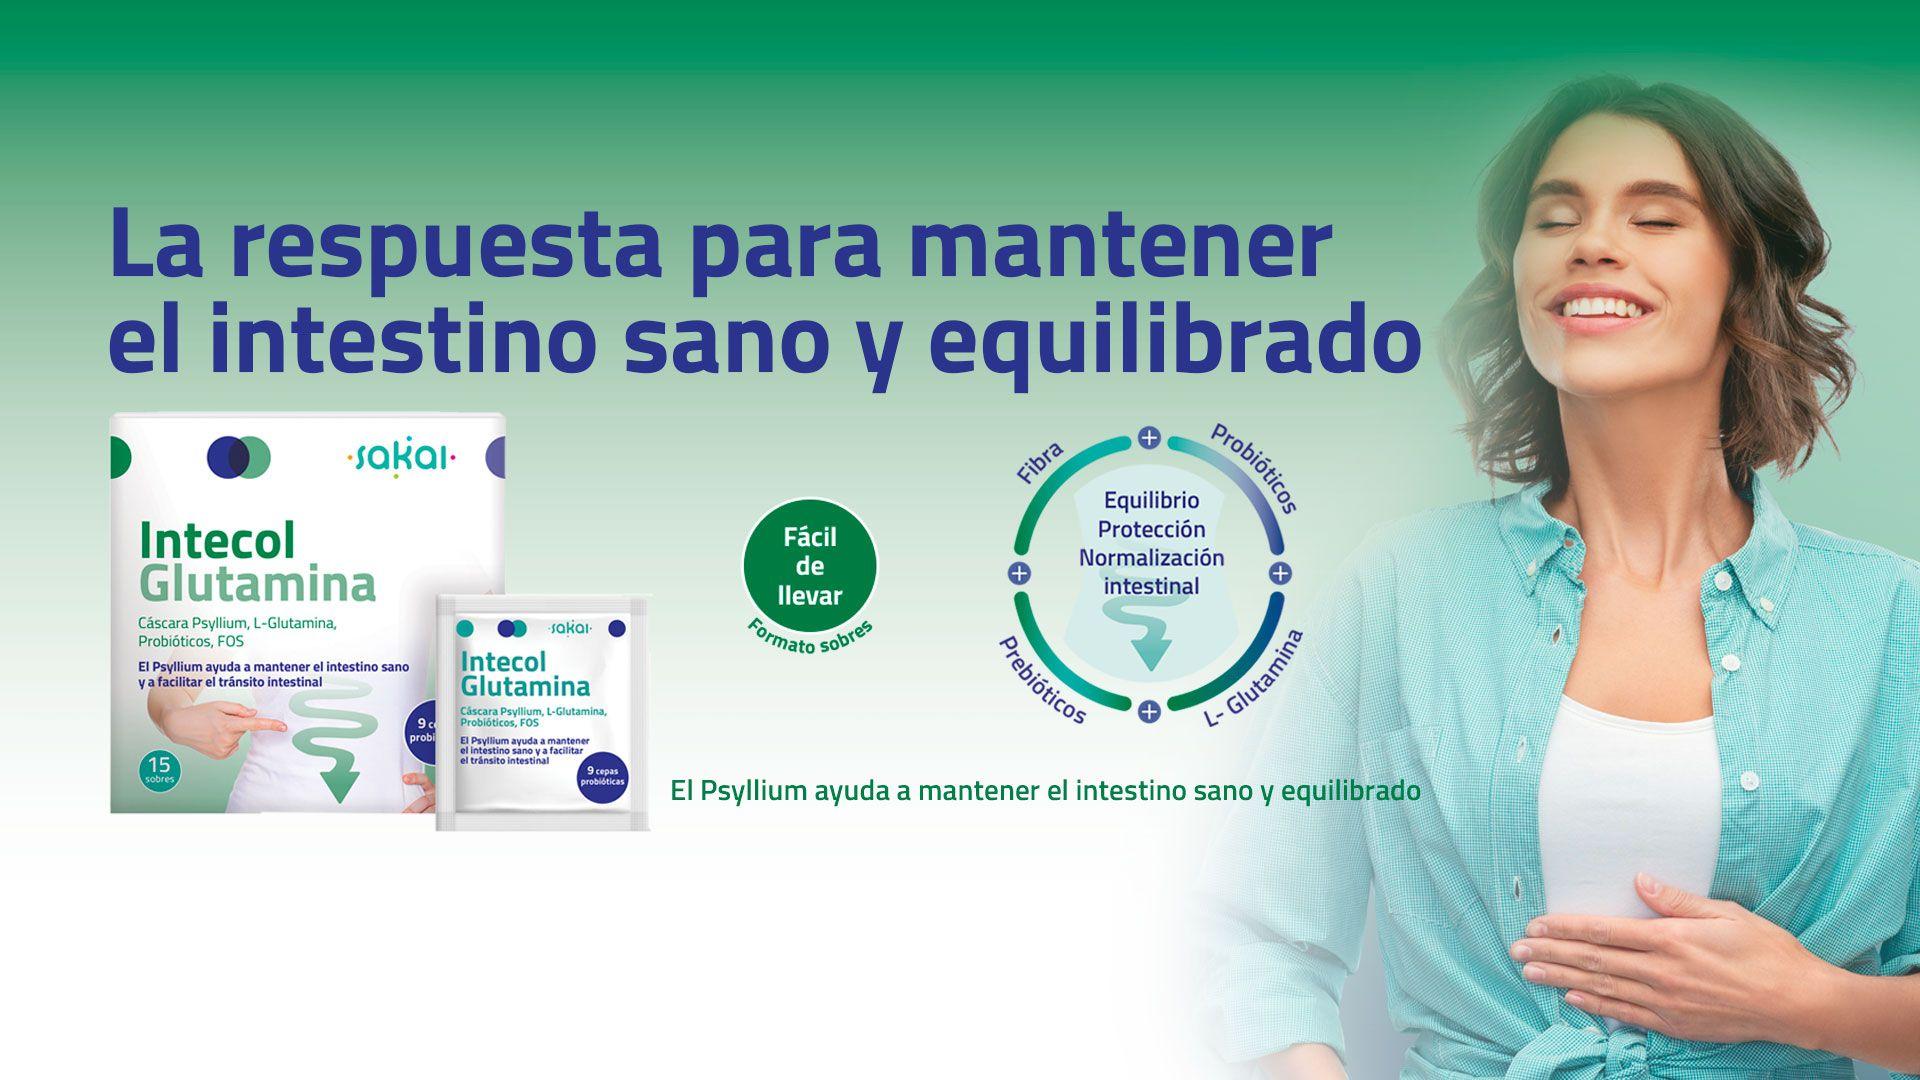 Intecol Glutamina: protege y activa tu intestino